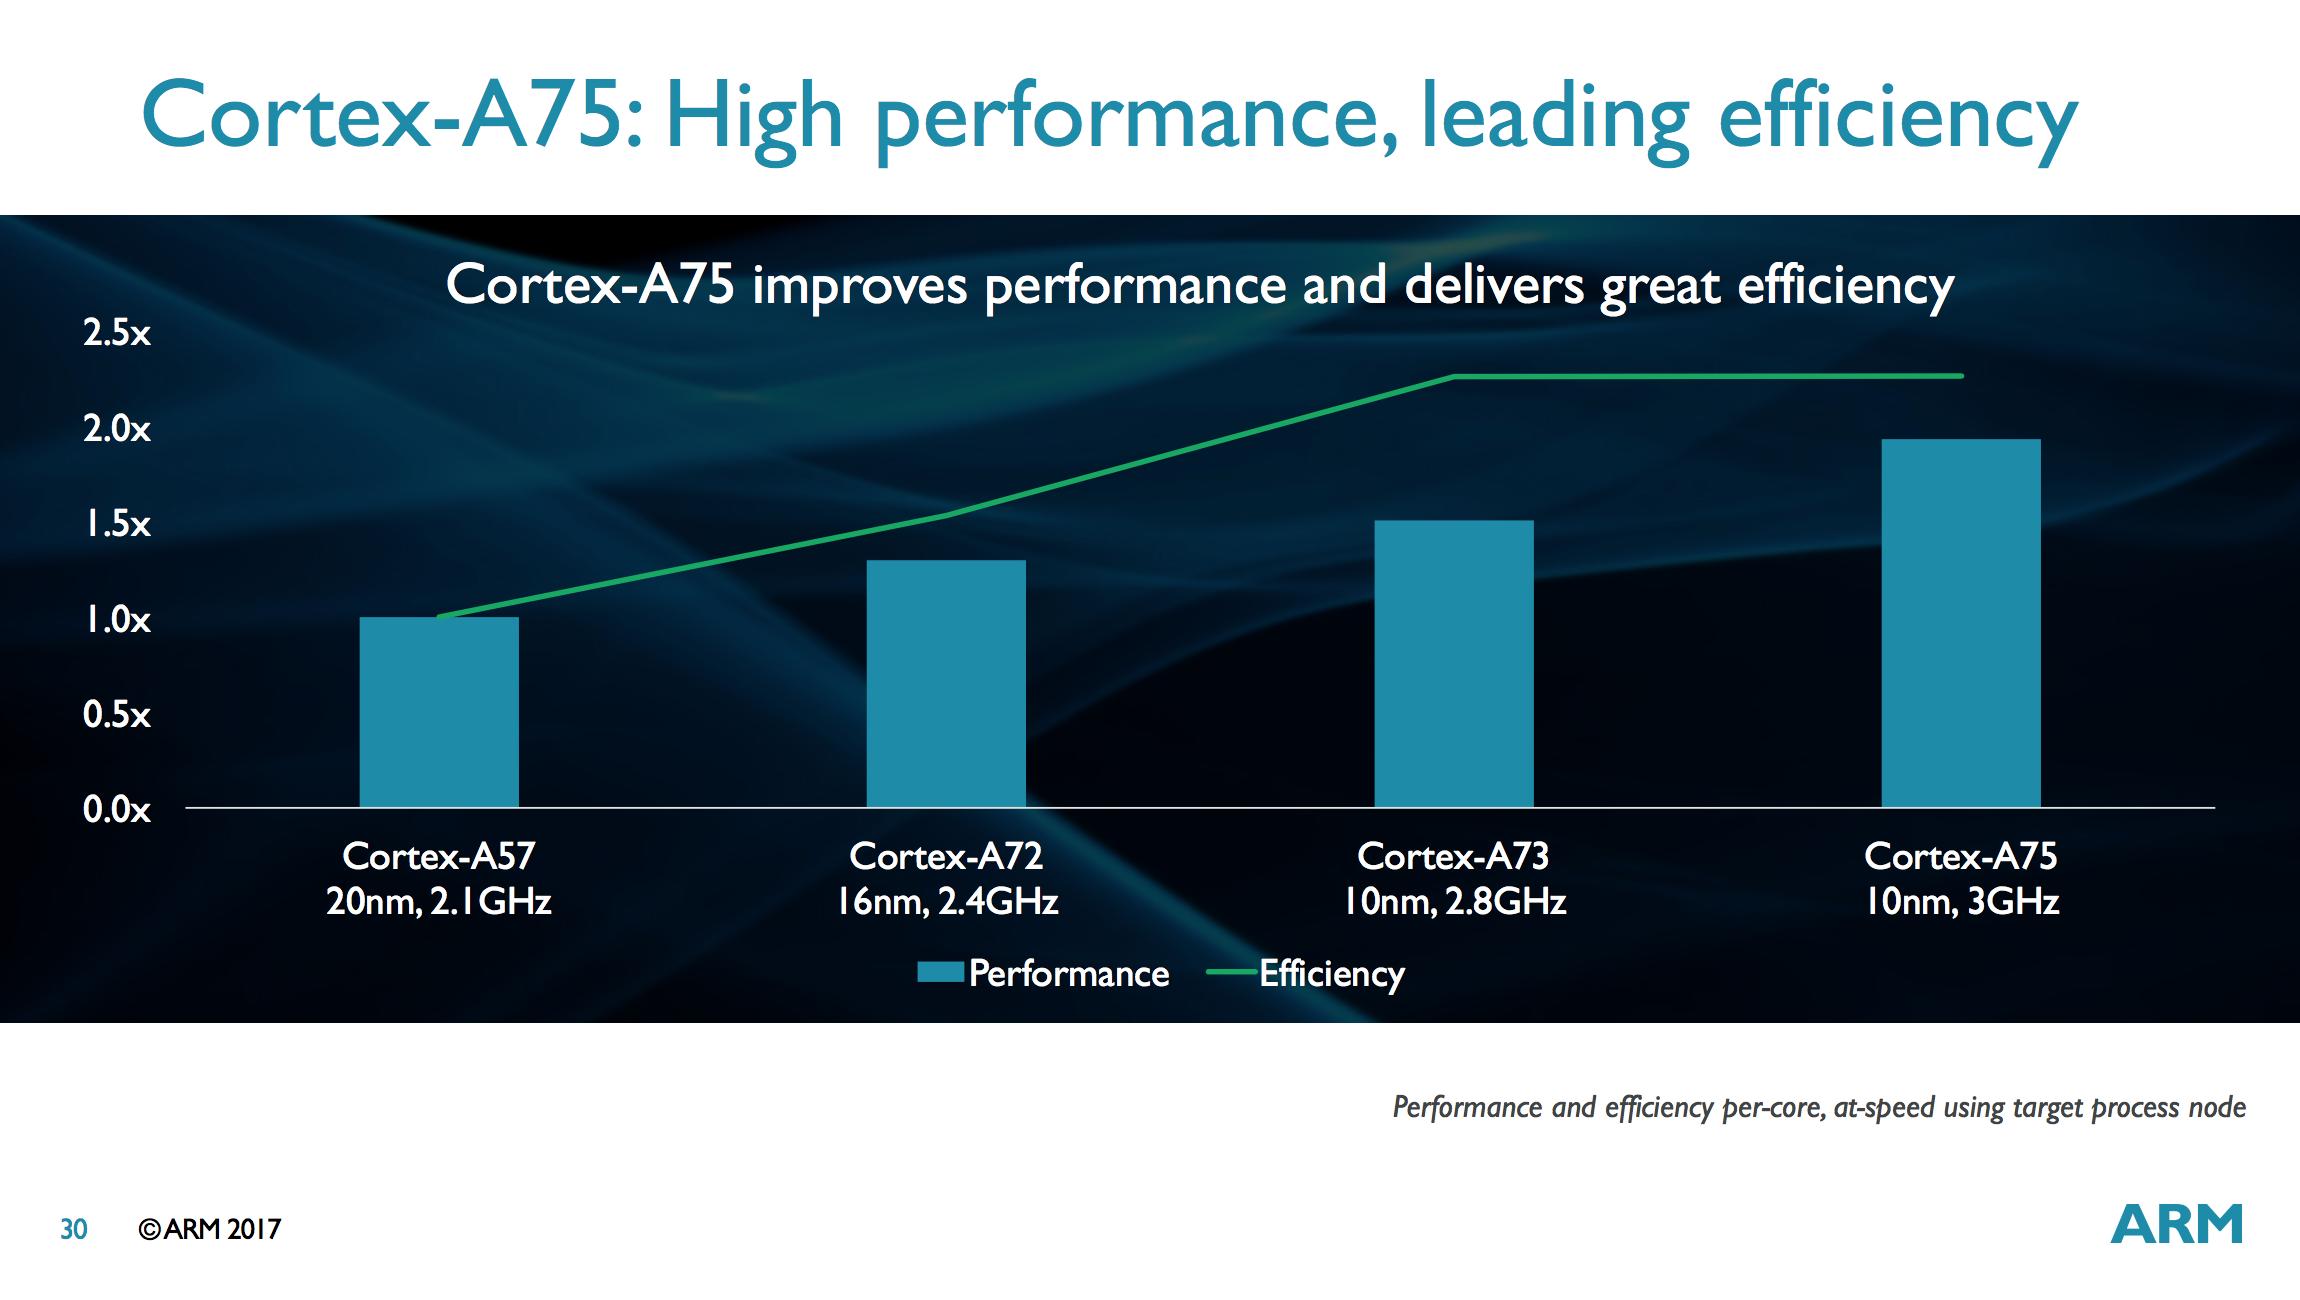 ARM анонсировала новые процессоры Cortex-A75, A55 и Mali-G72 - 5